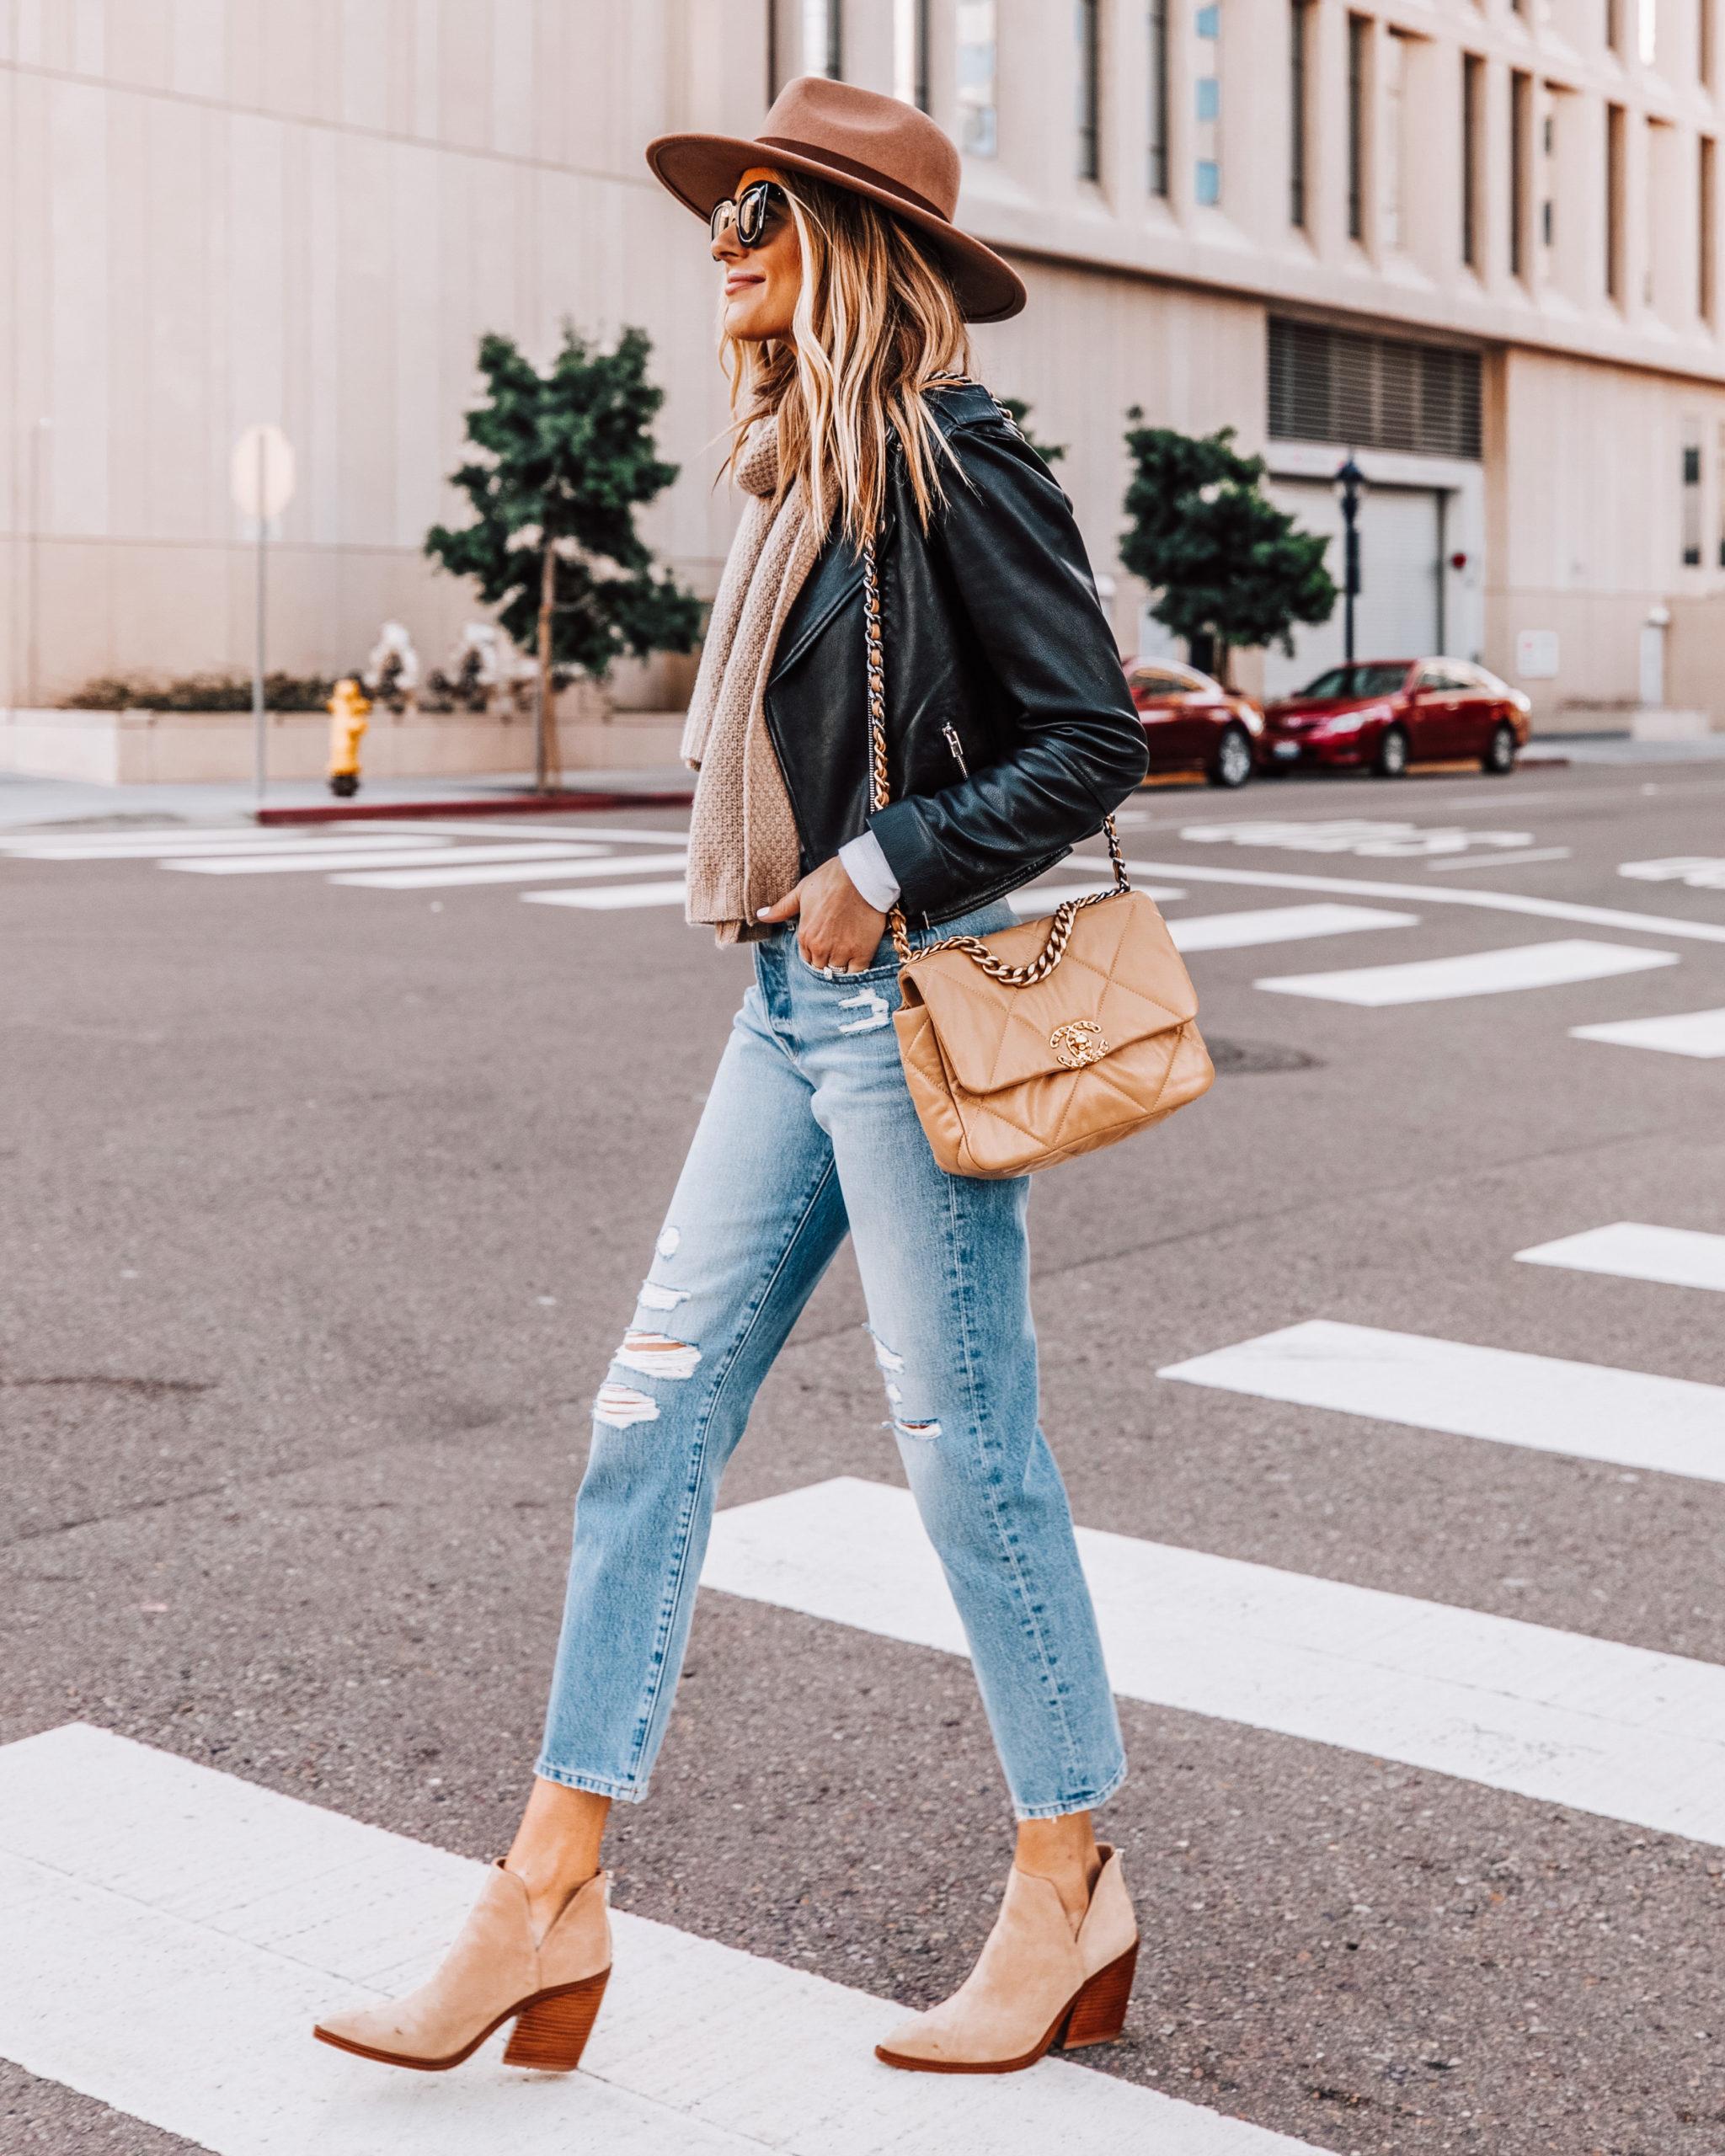 Fashion Jackson Wearing Brown Hat Black Leather Jacket Ripped Jeans Tan Booties Chanel Handbag